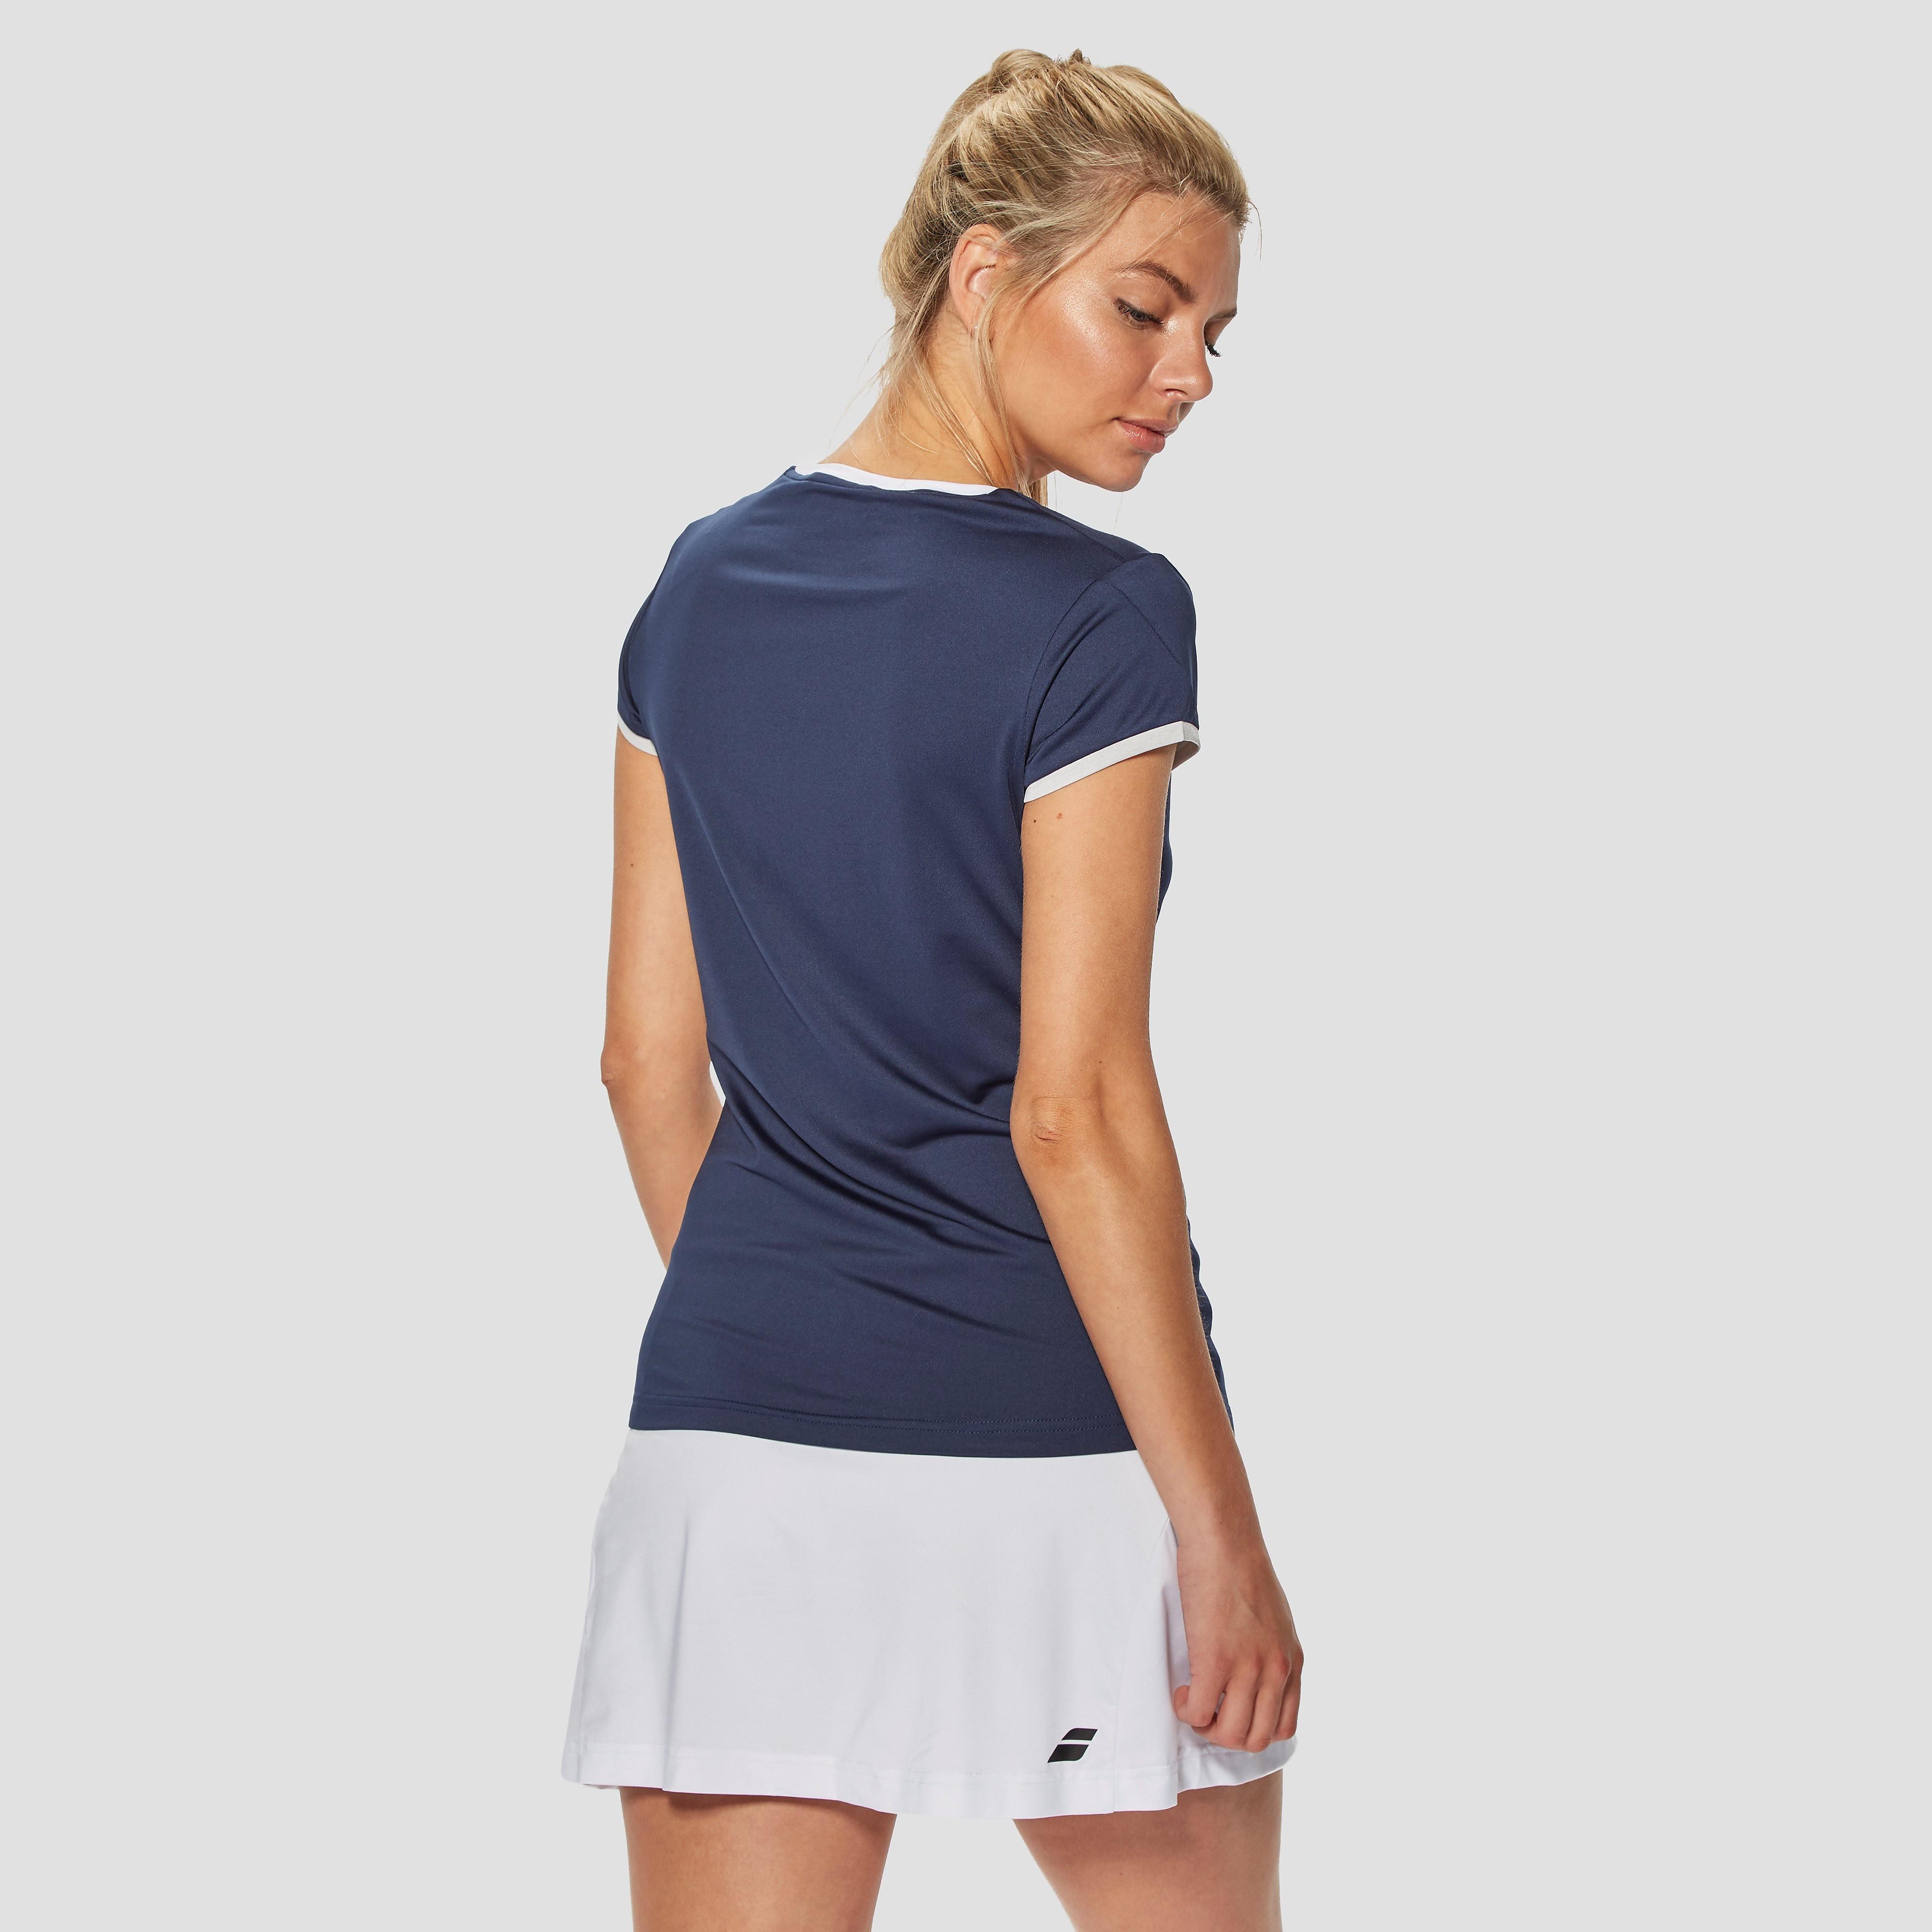 Babolat Wimbledon Performance Women's Top